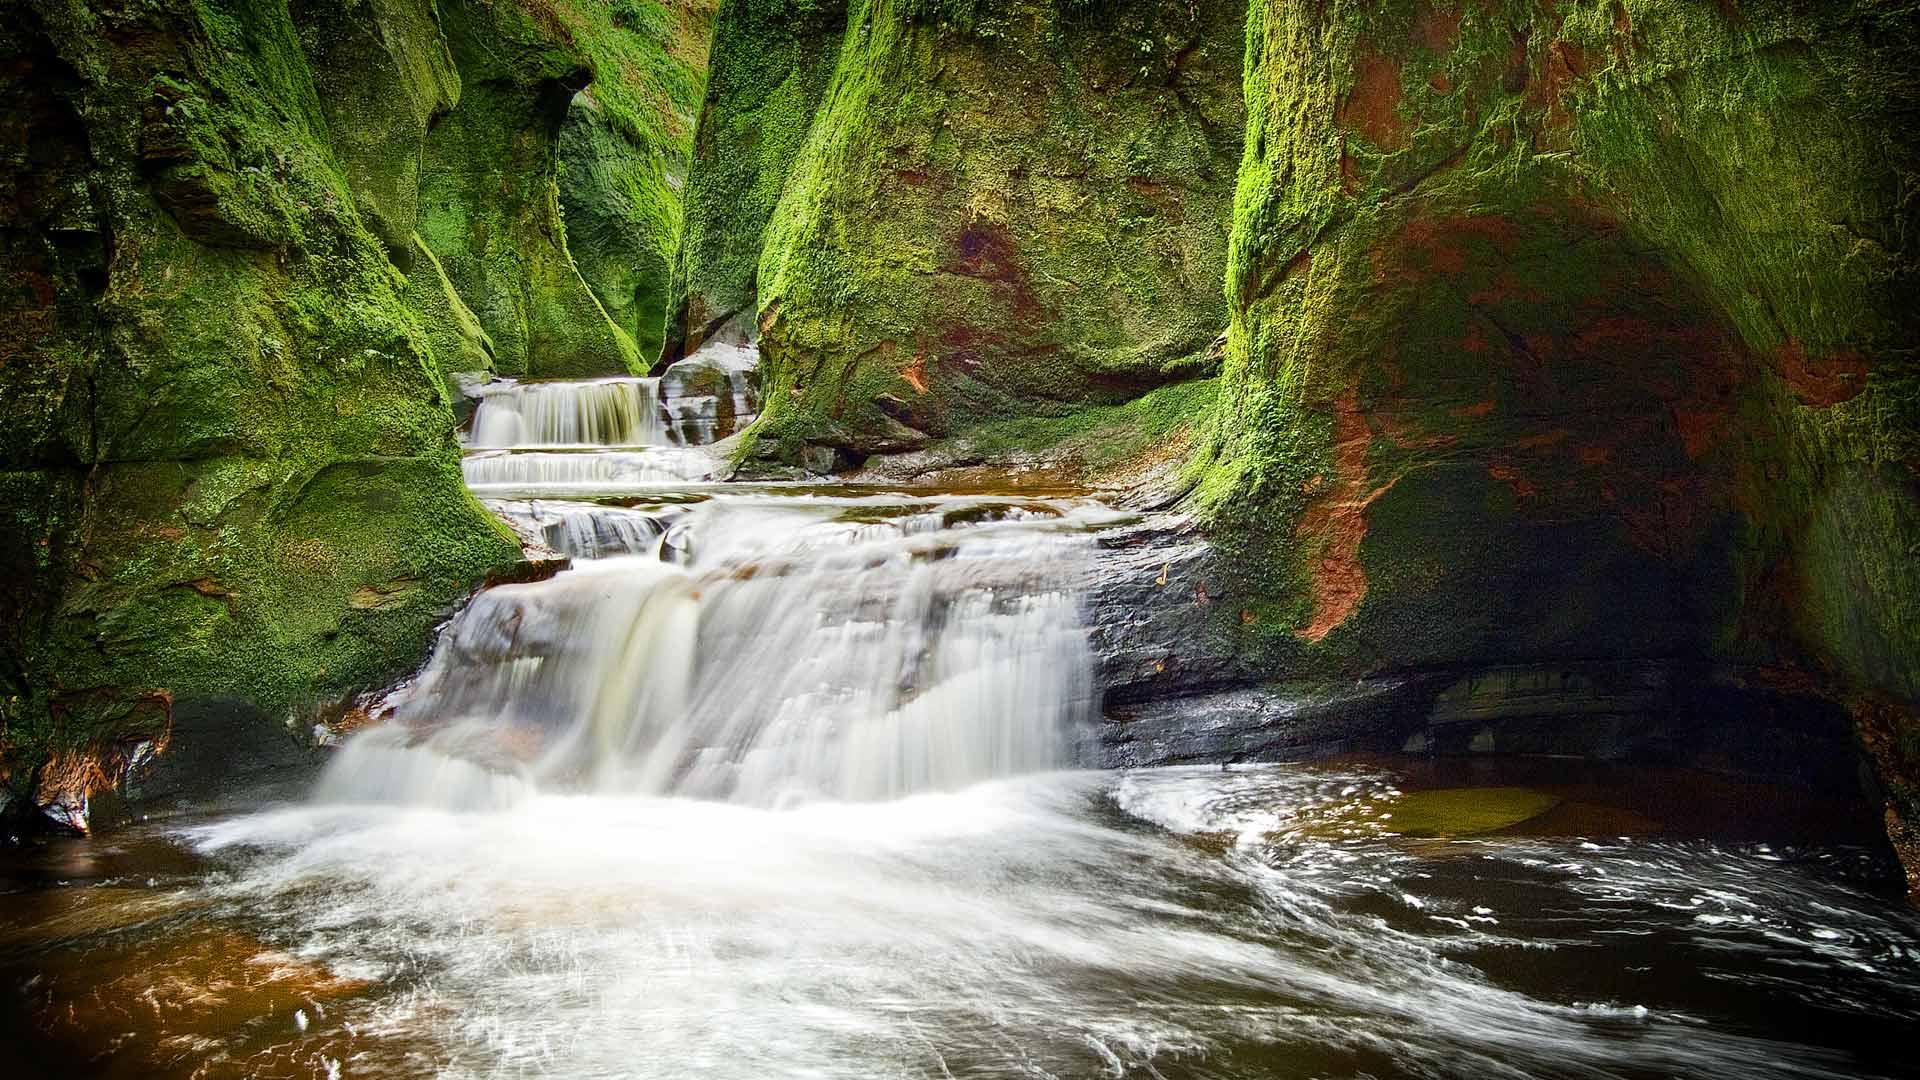 Finnich Glen in Stirlingshire, Scotland (© Damian Shields/Offset)